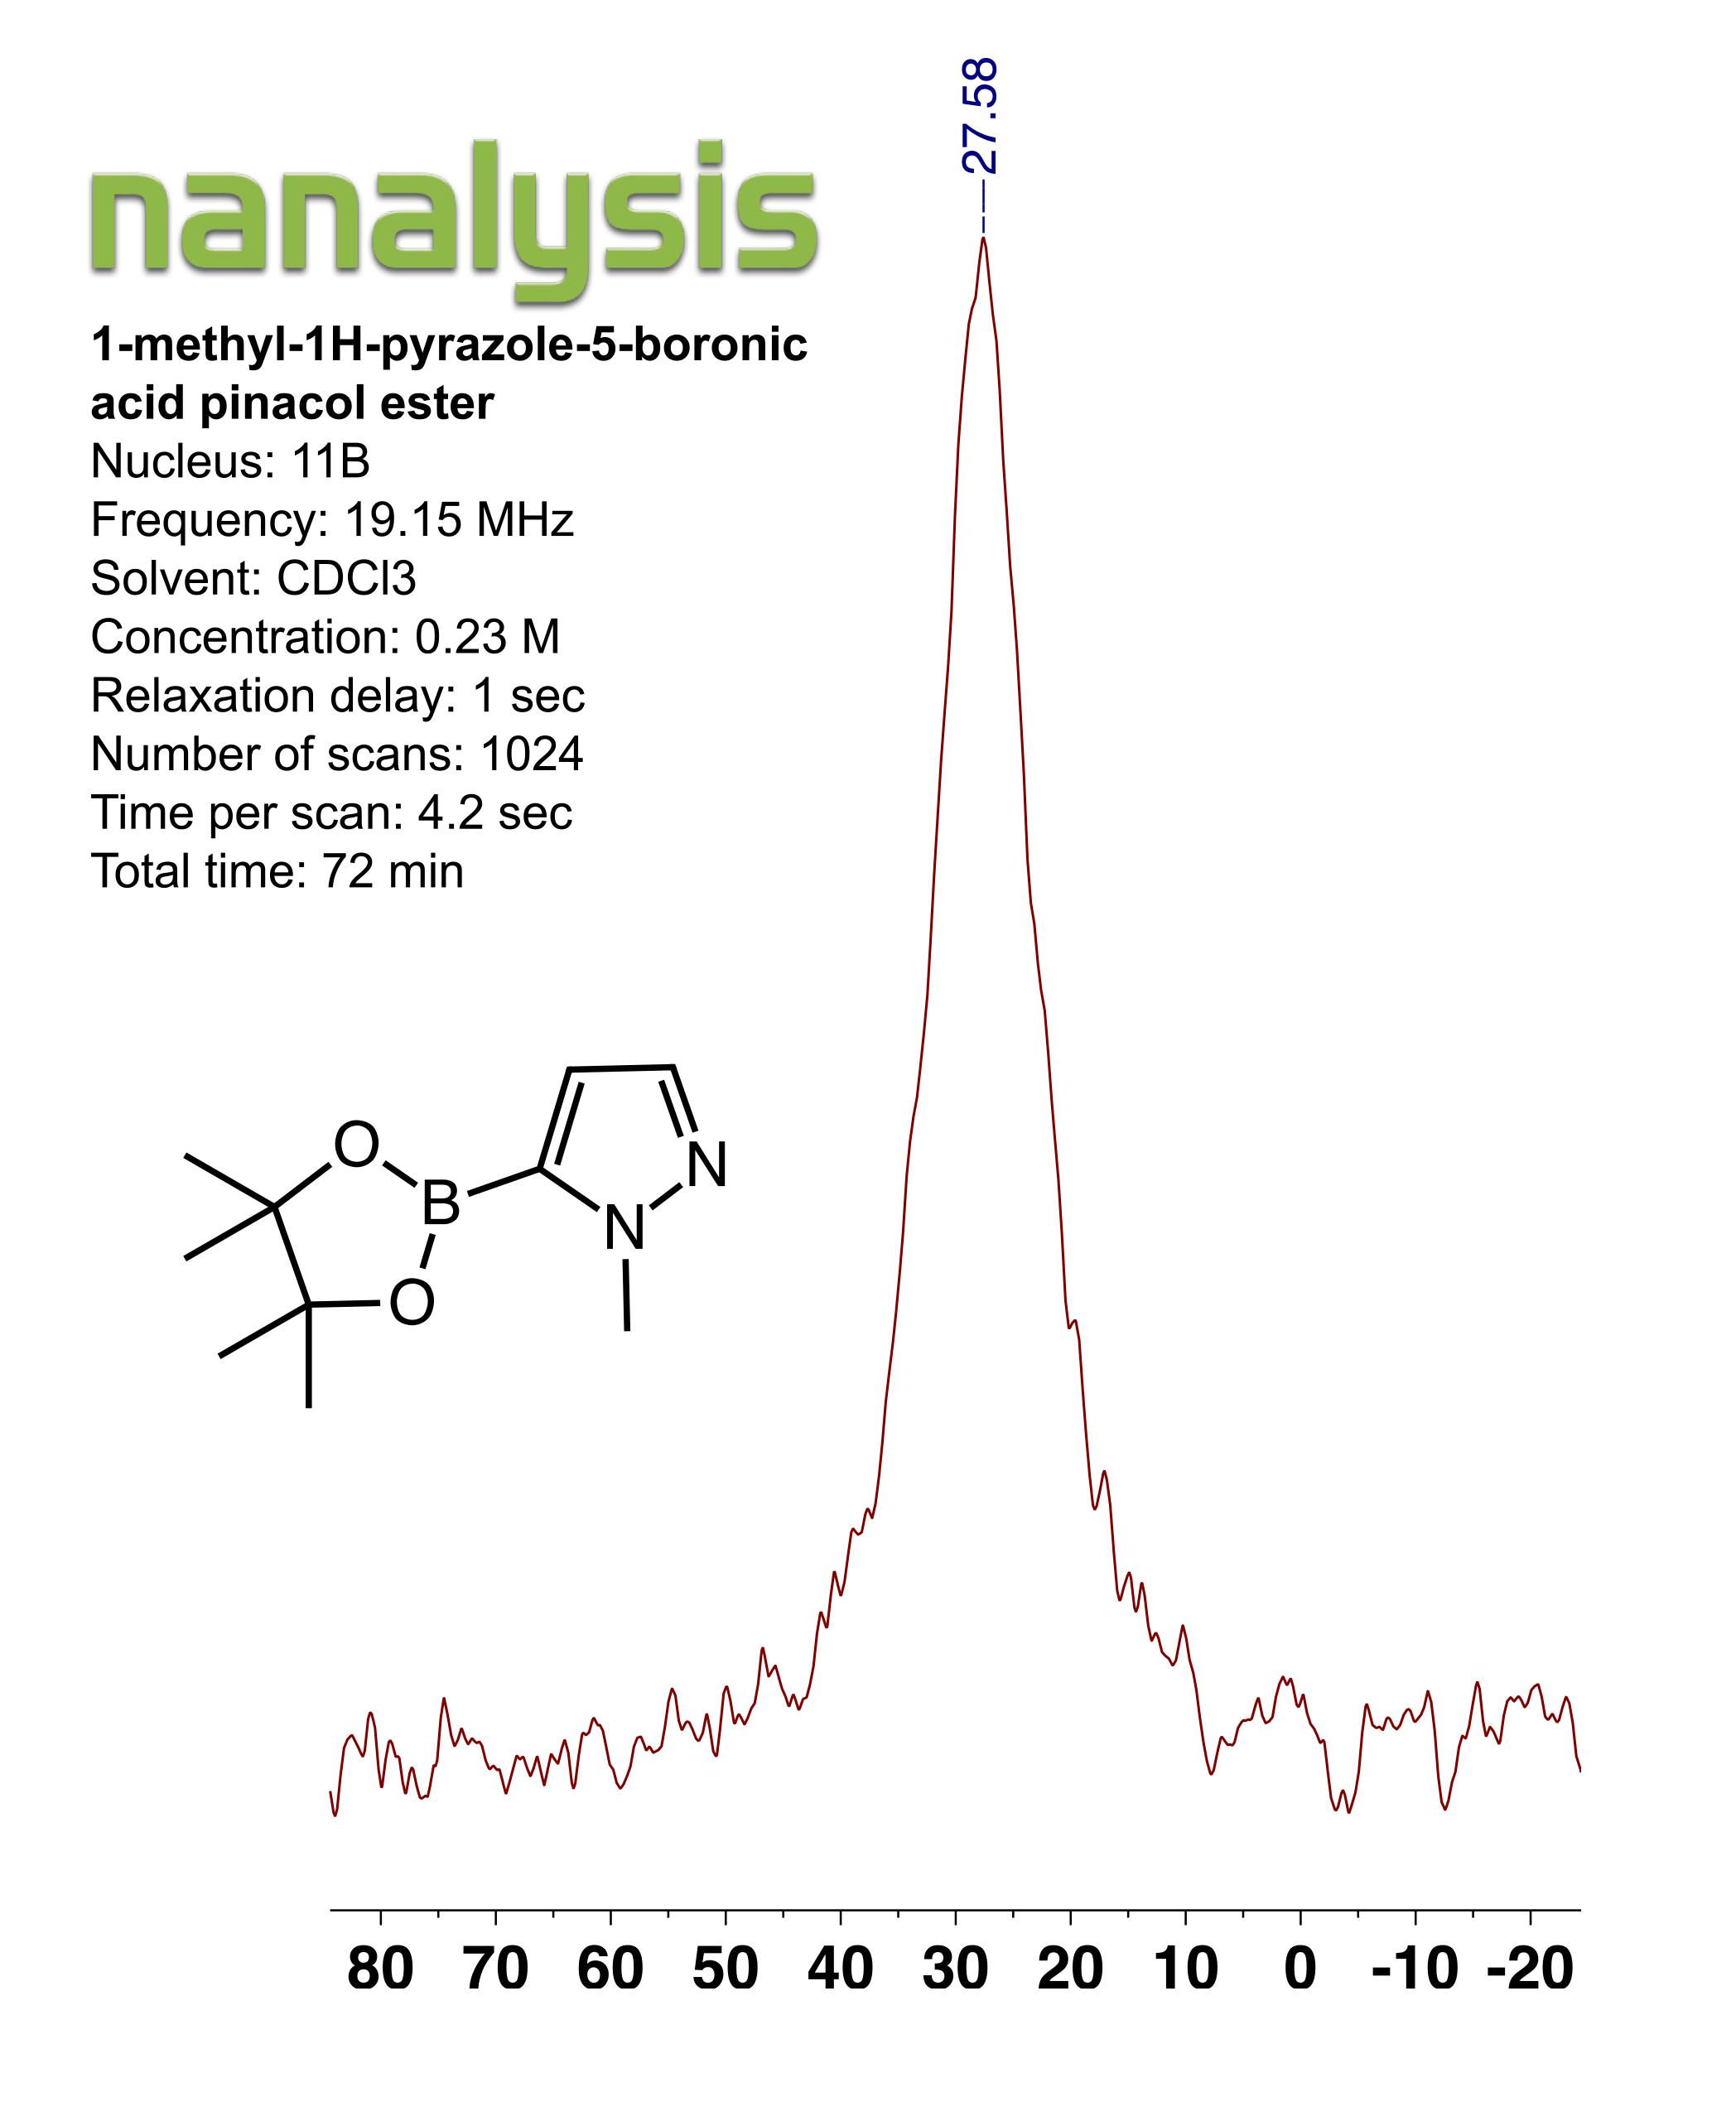 1-methyl-1H-pyrazole-5-boronic acid pincol ester